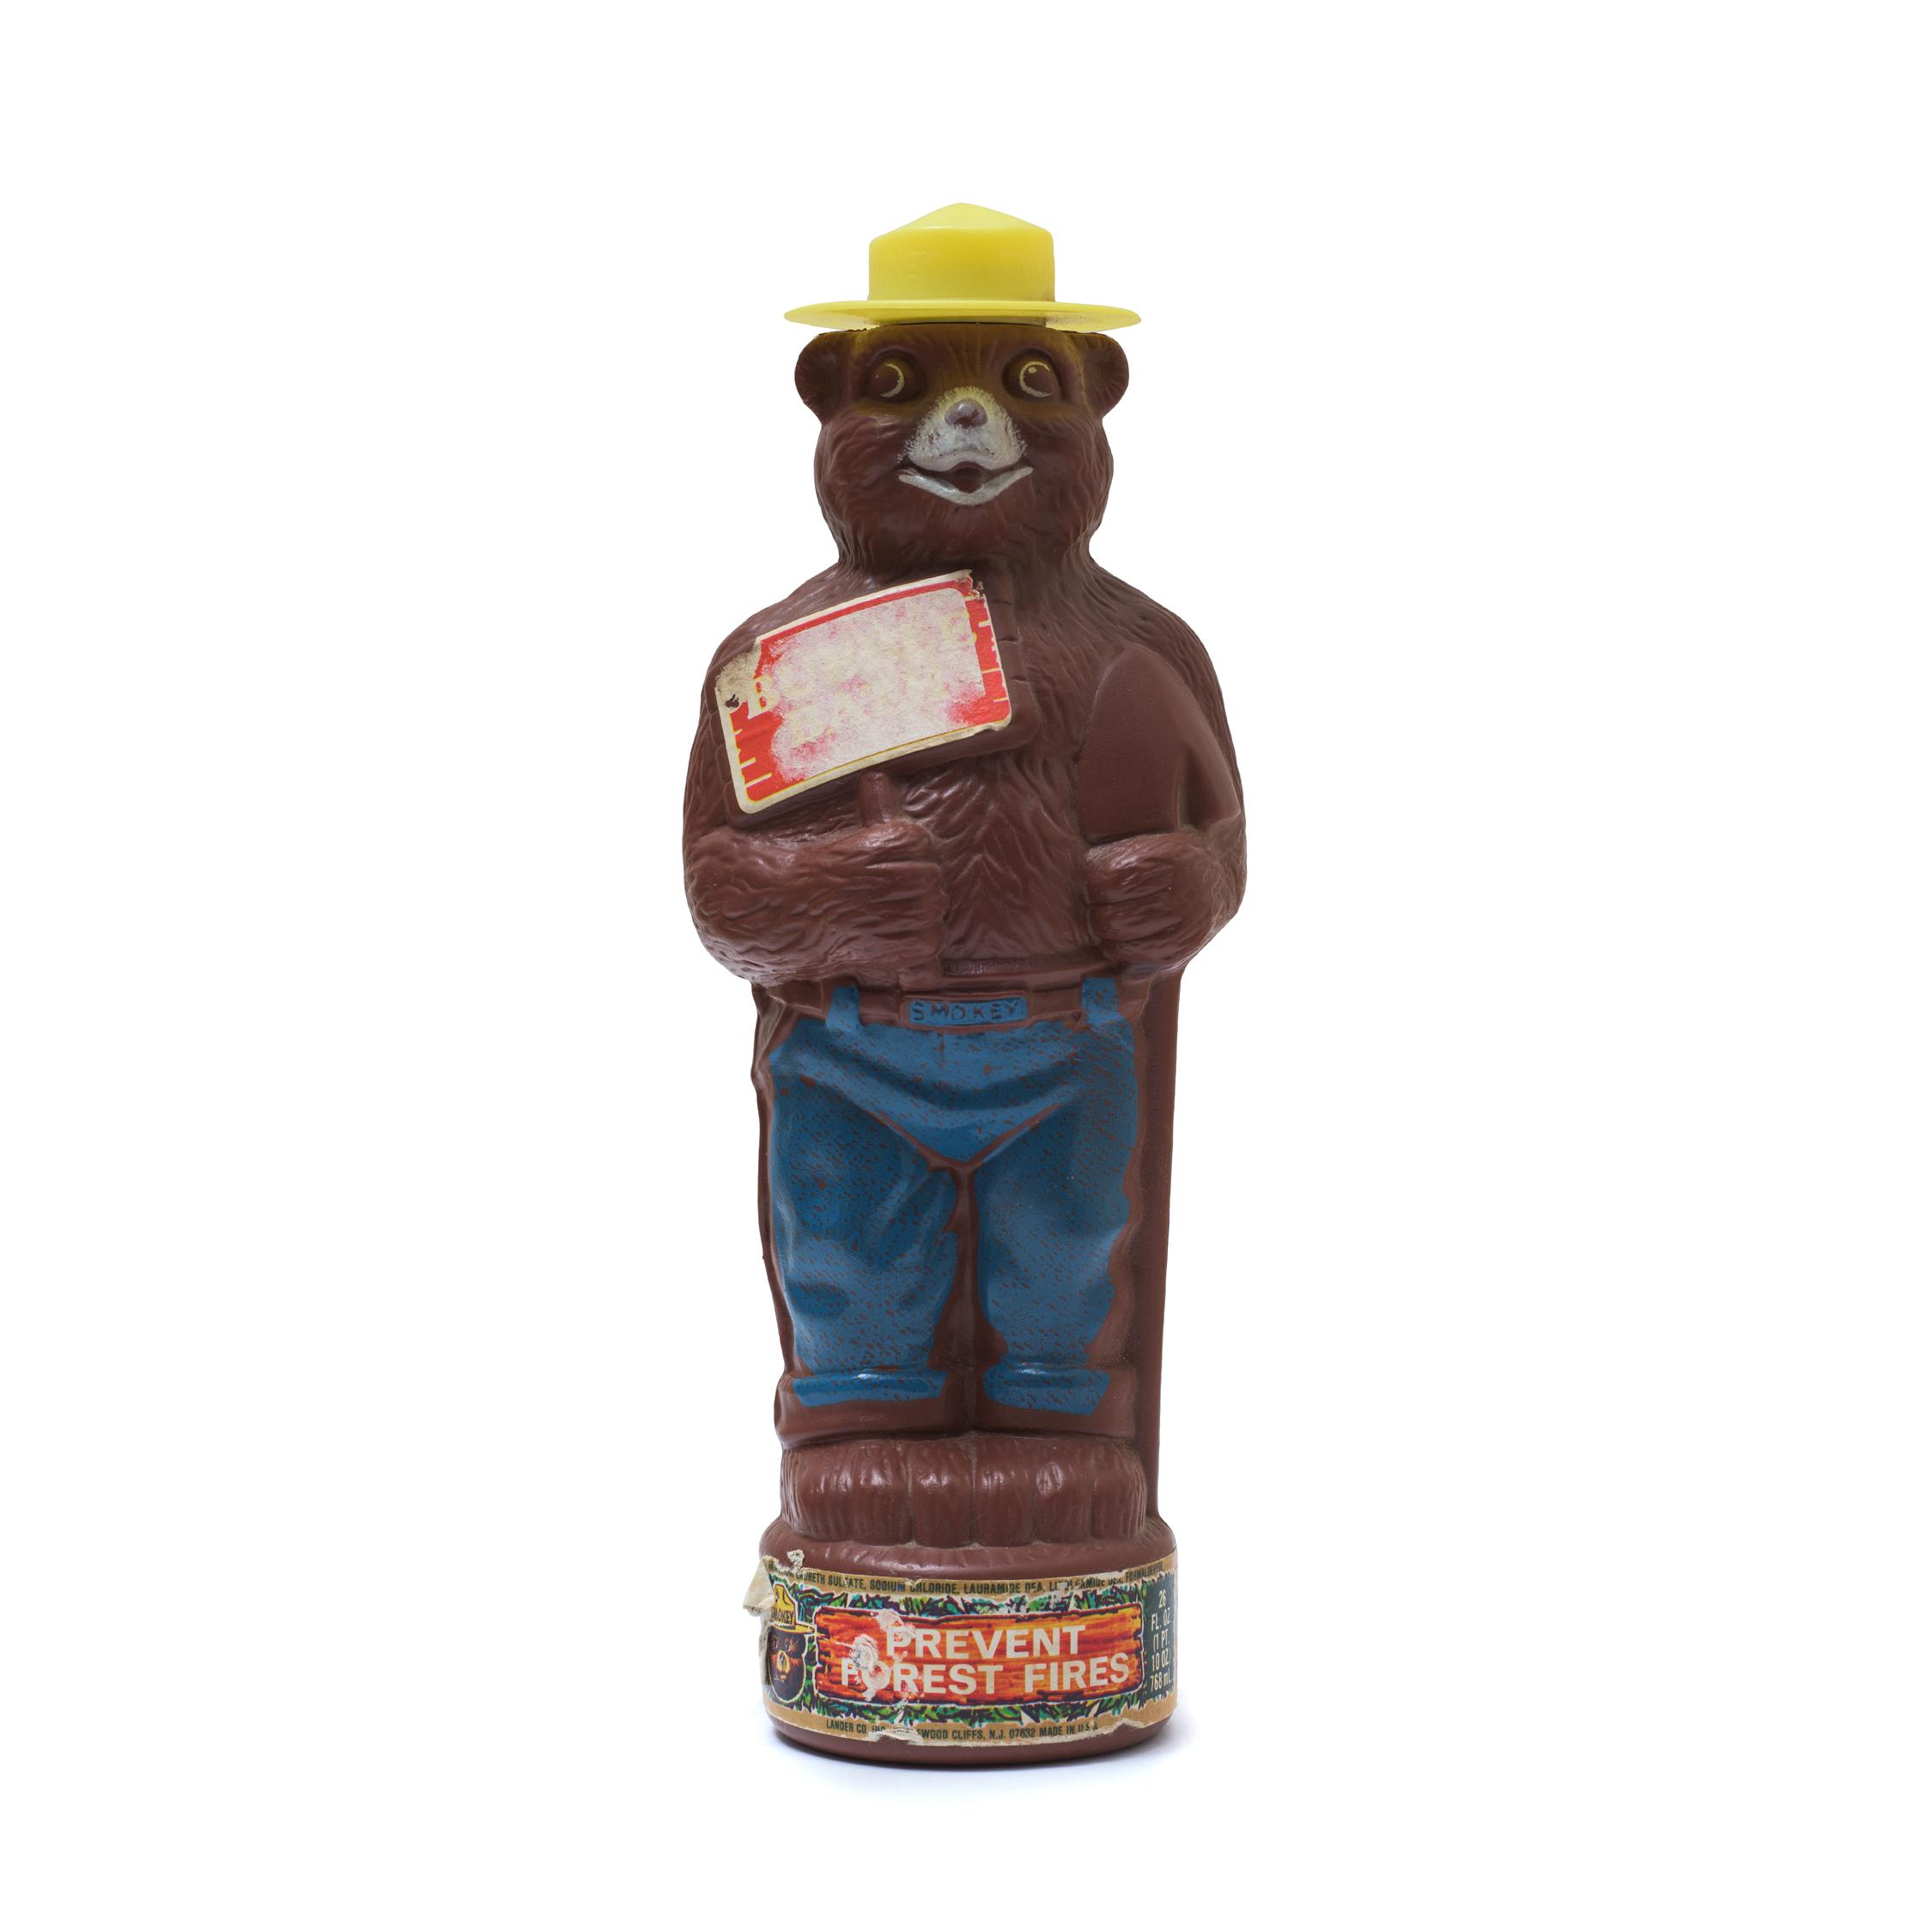 smokey_bear_shampoo_bottle.jpg